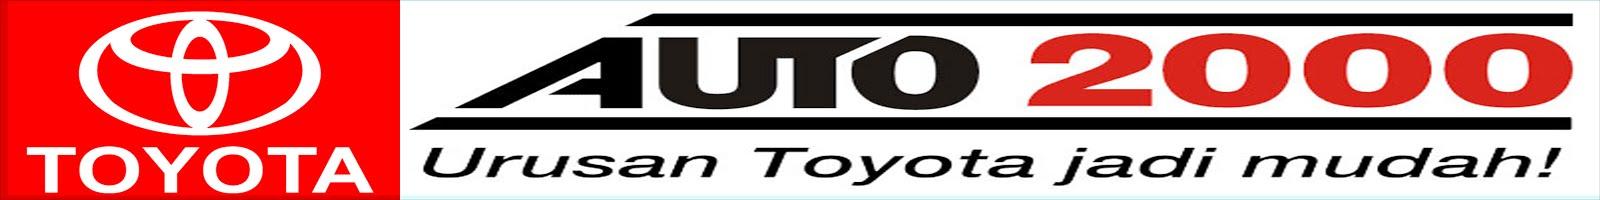 In Sing | Toyota Astra Auto2000 Surabaya